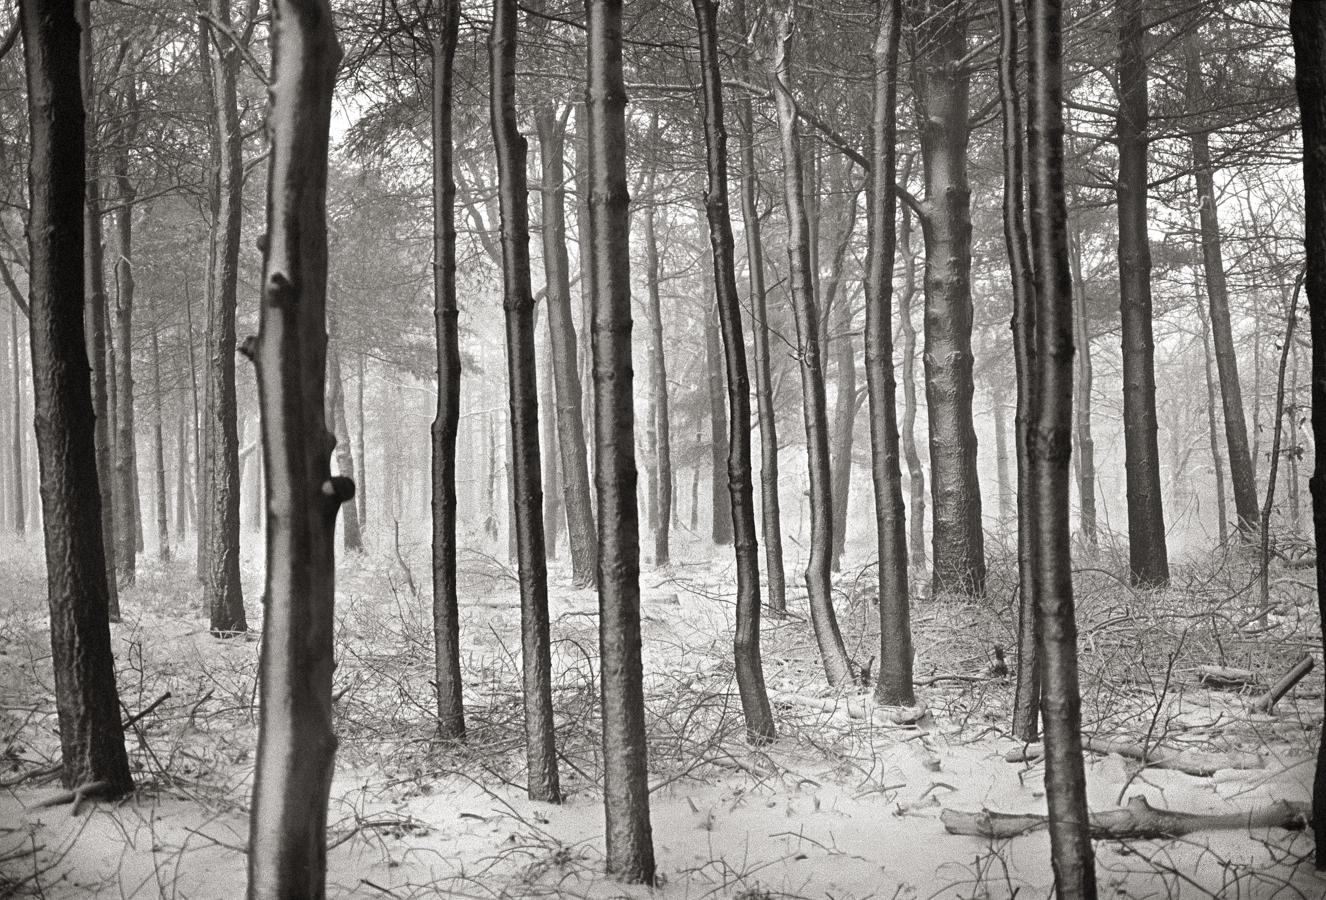 zide_woods in snow_west tisbury_ma _.jpg